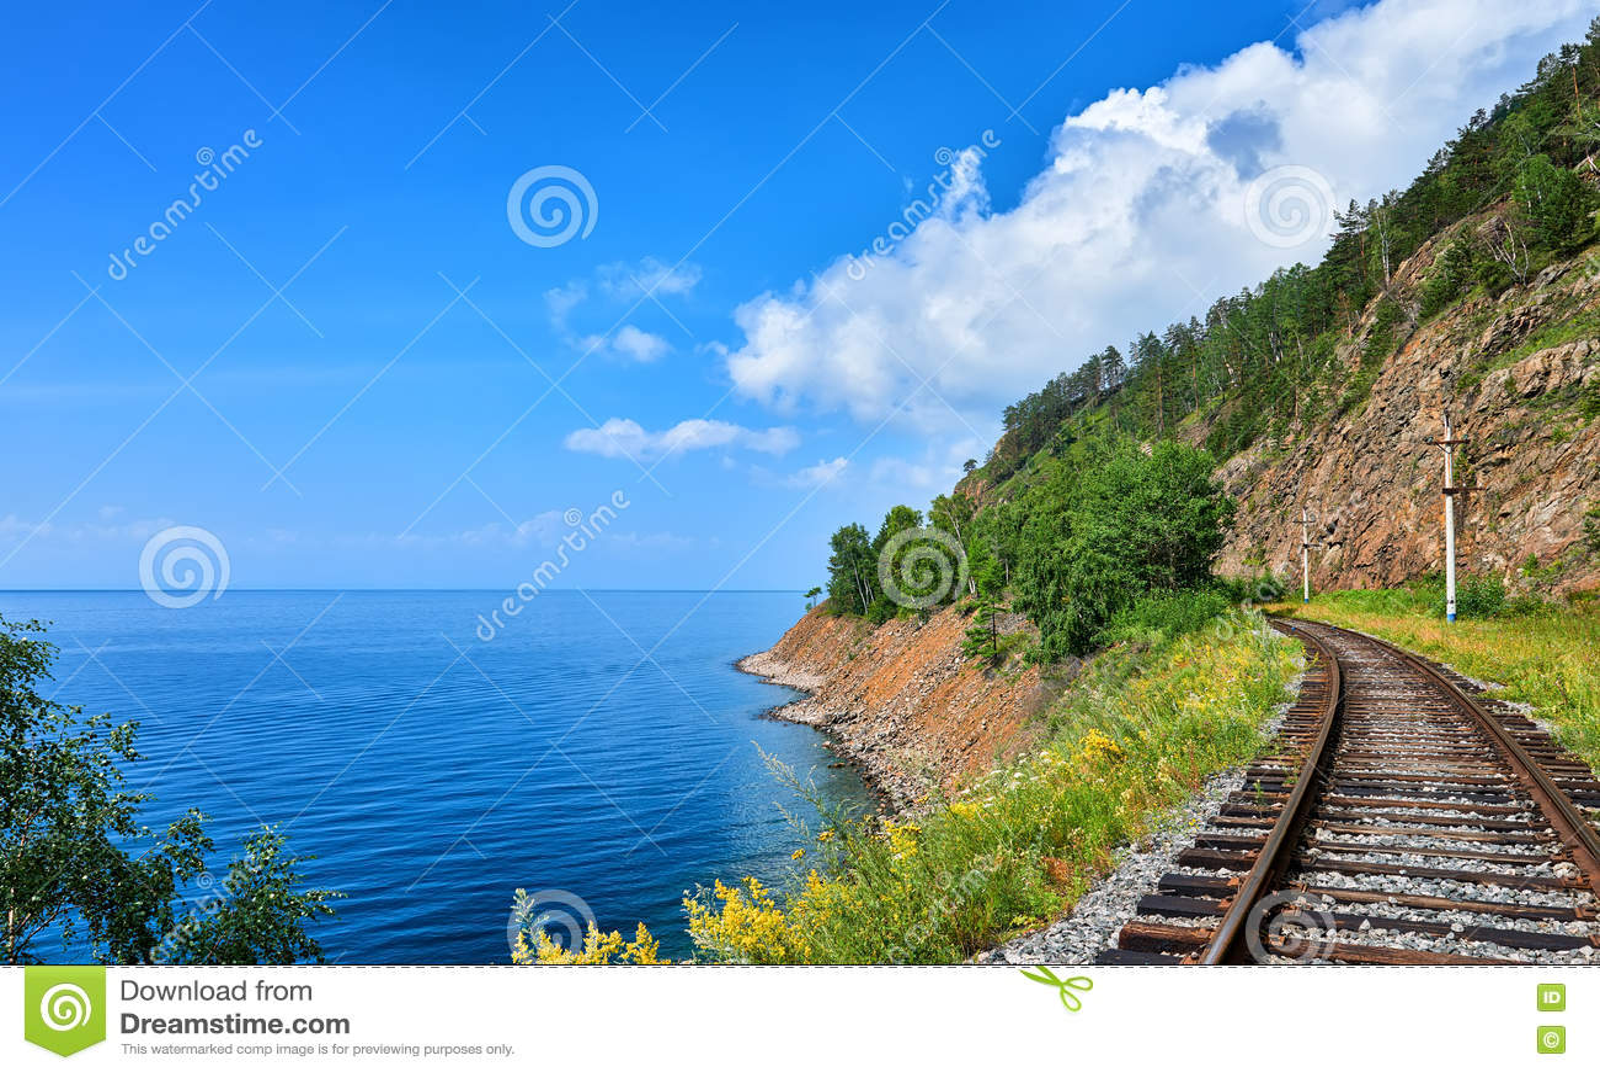 De spoorweg van perceel circum-Baikal dichtbij steile bank van Meer Baikal